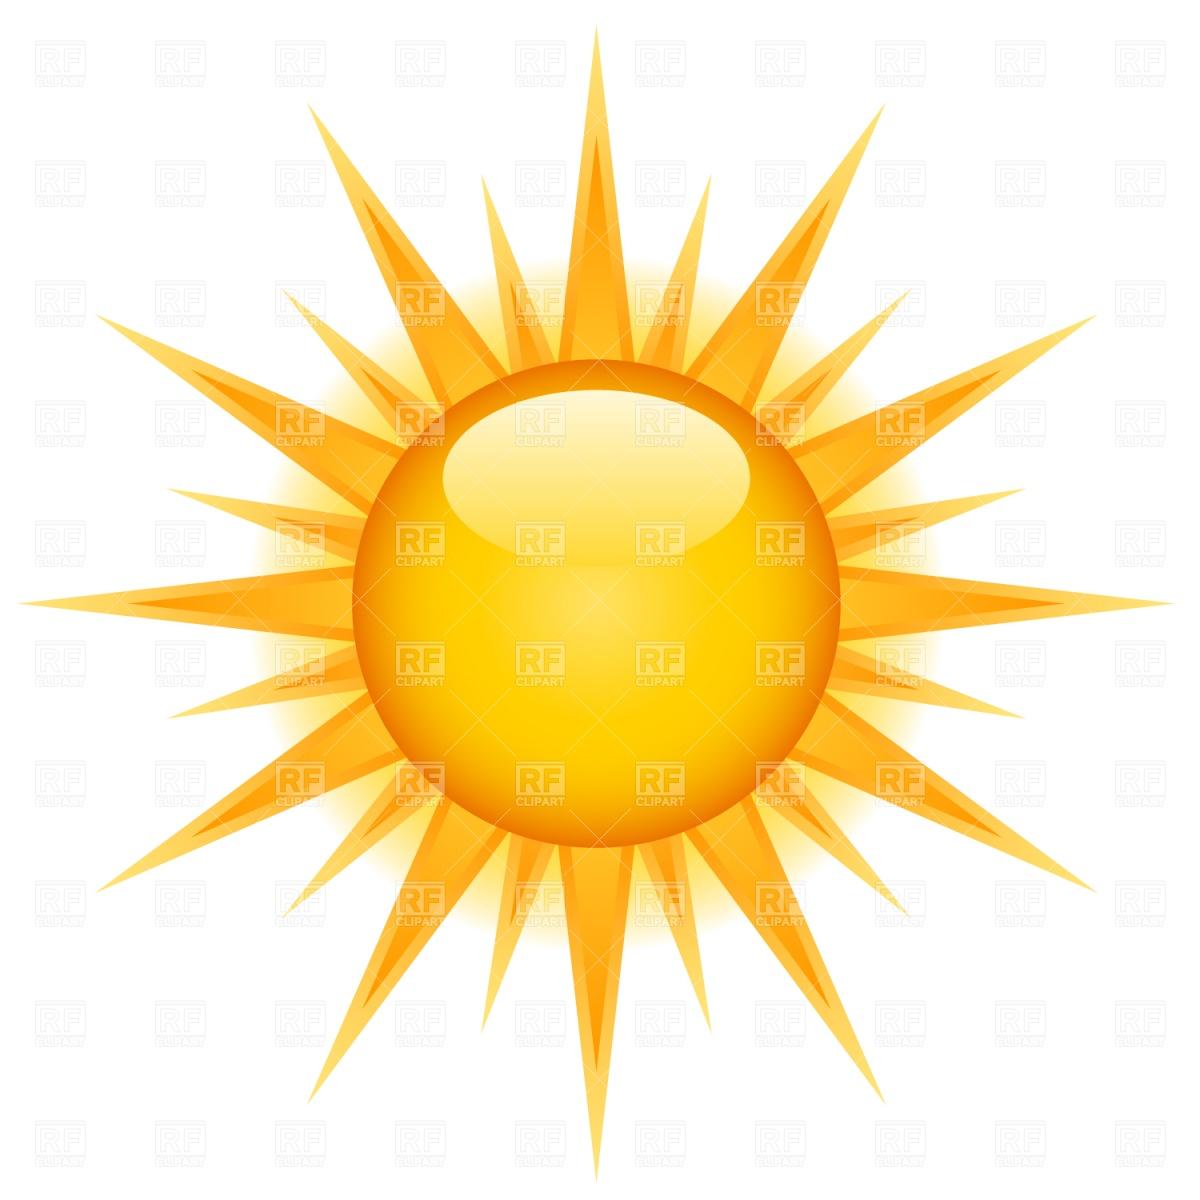 Wallpaper clipart sun Sun Sun Desktop of Full